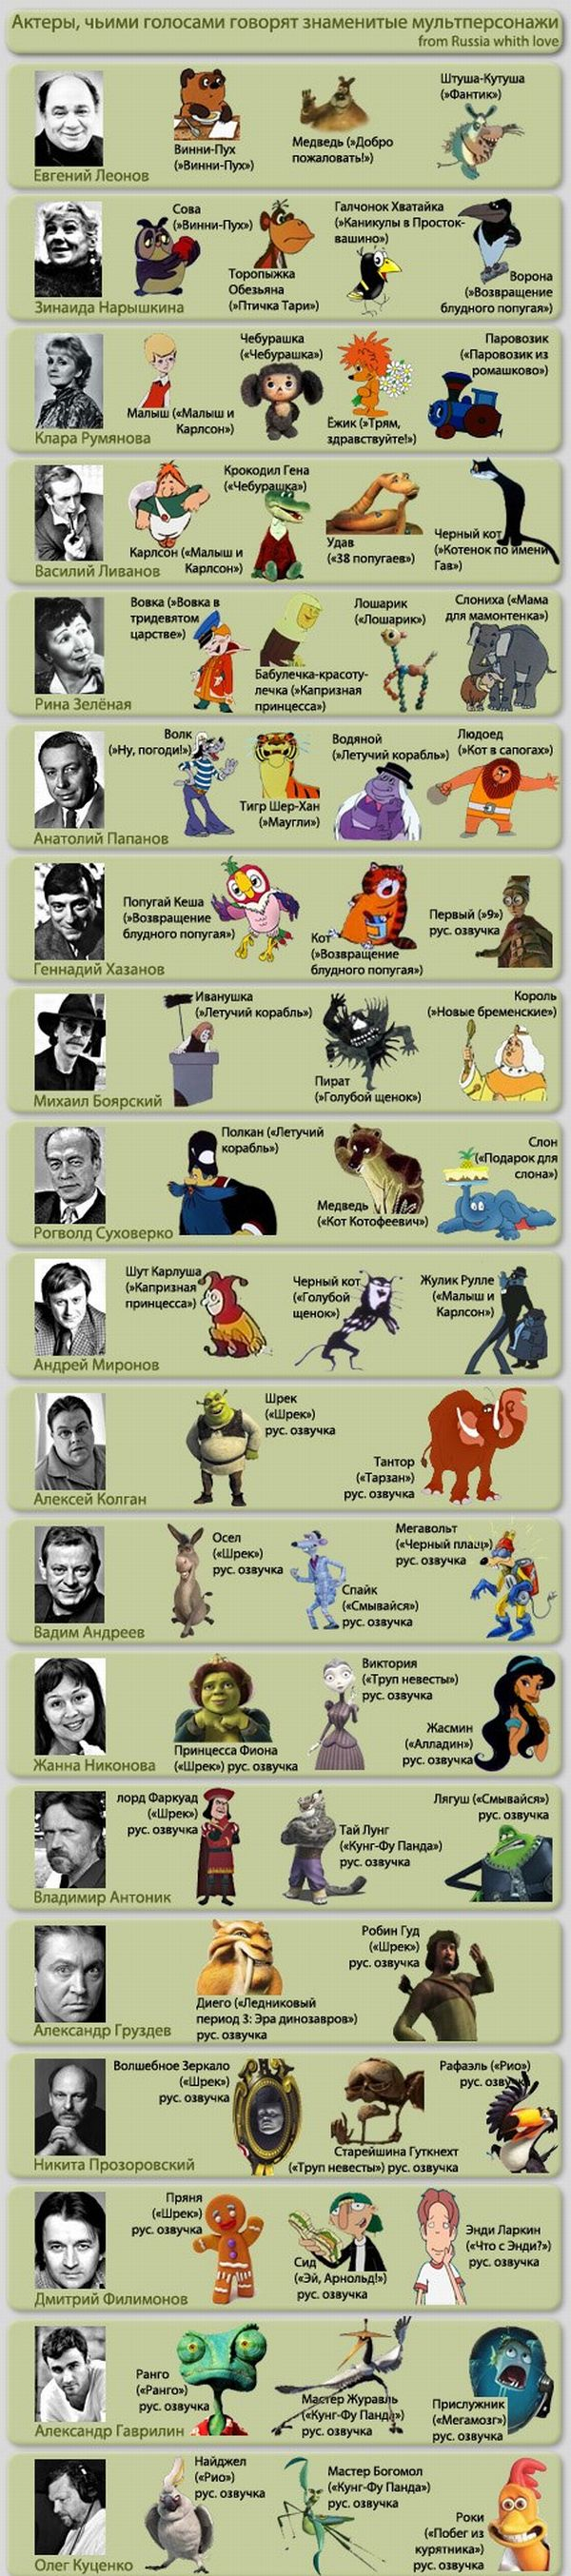 Актеры, которые озвучили мультперсонажей (1 картинка)